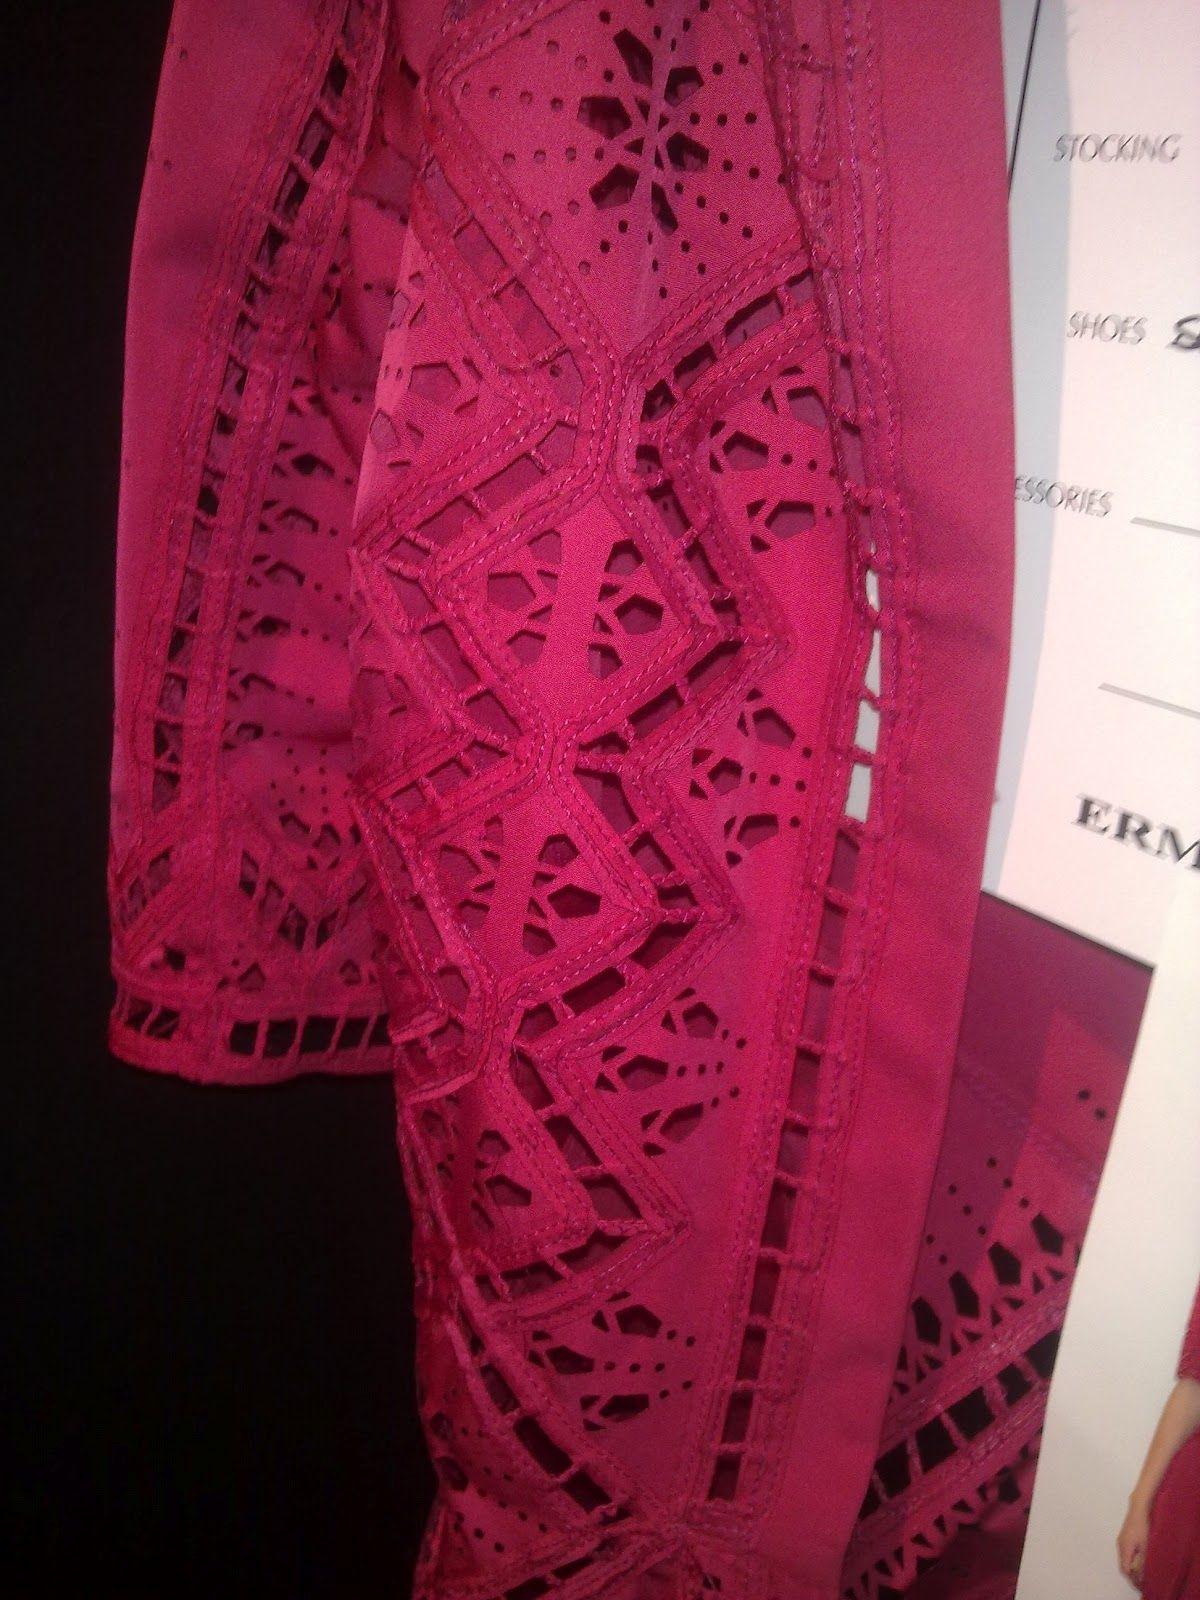 Ermanno Scervino Spring Summer 2013 Fashion Show